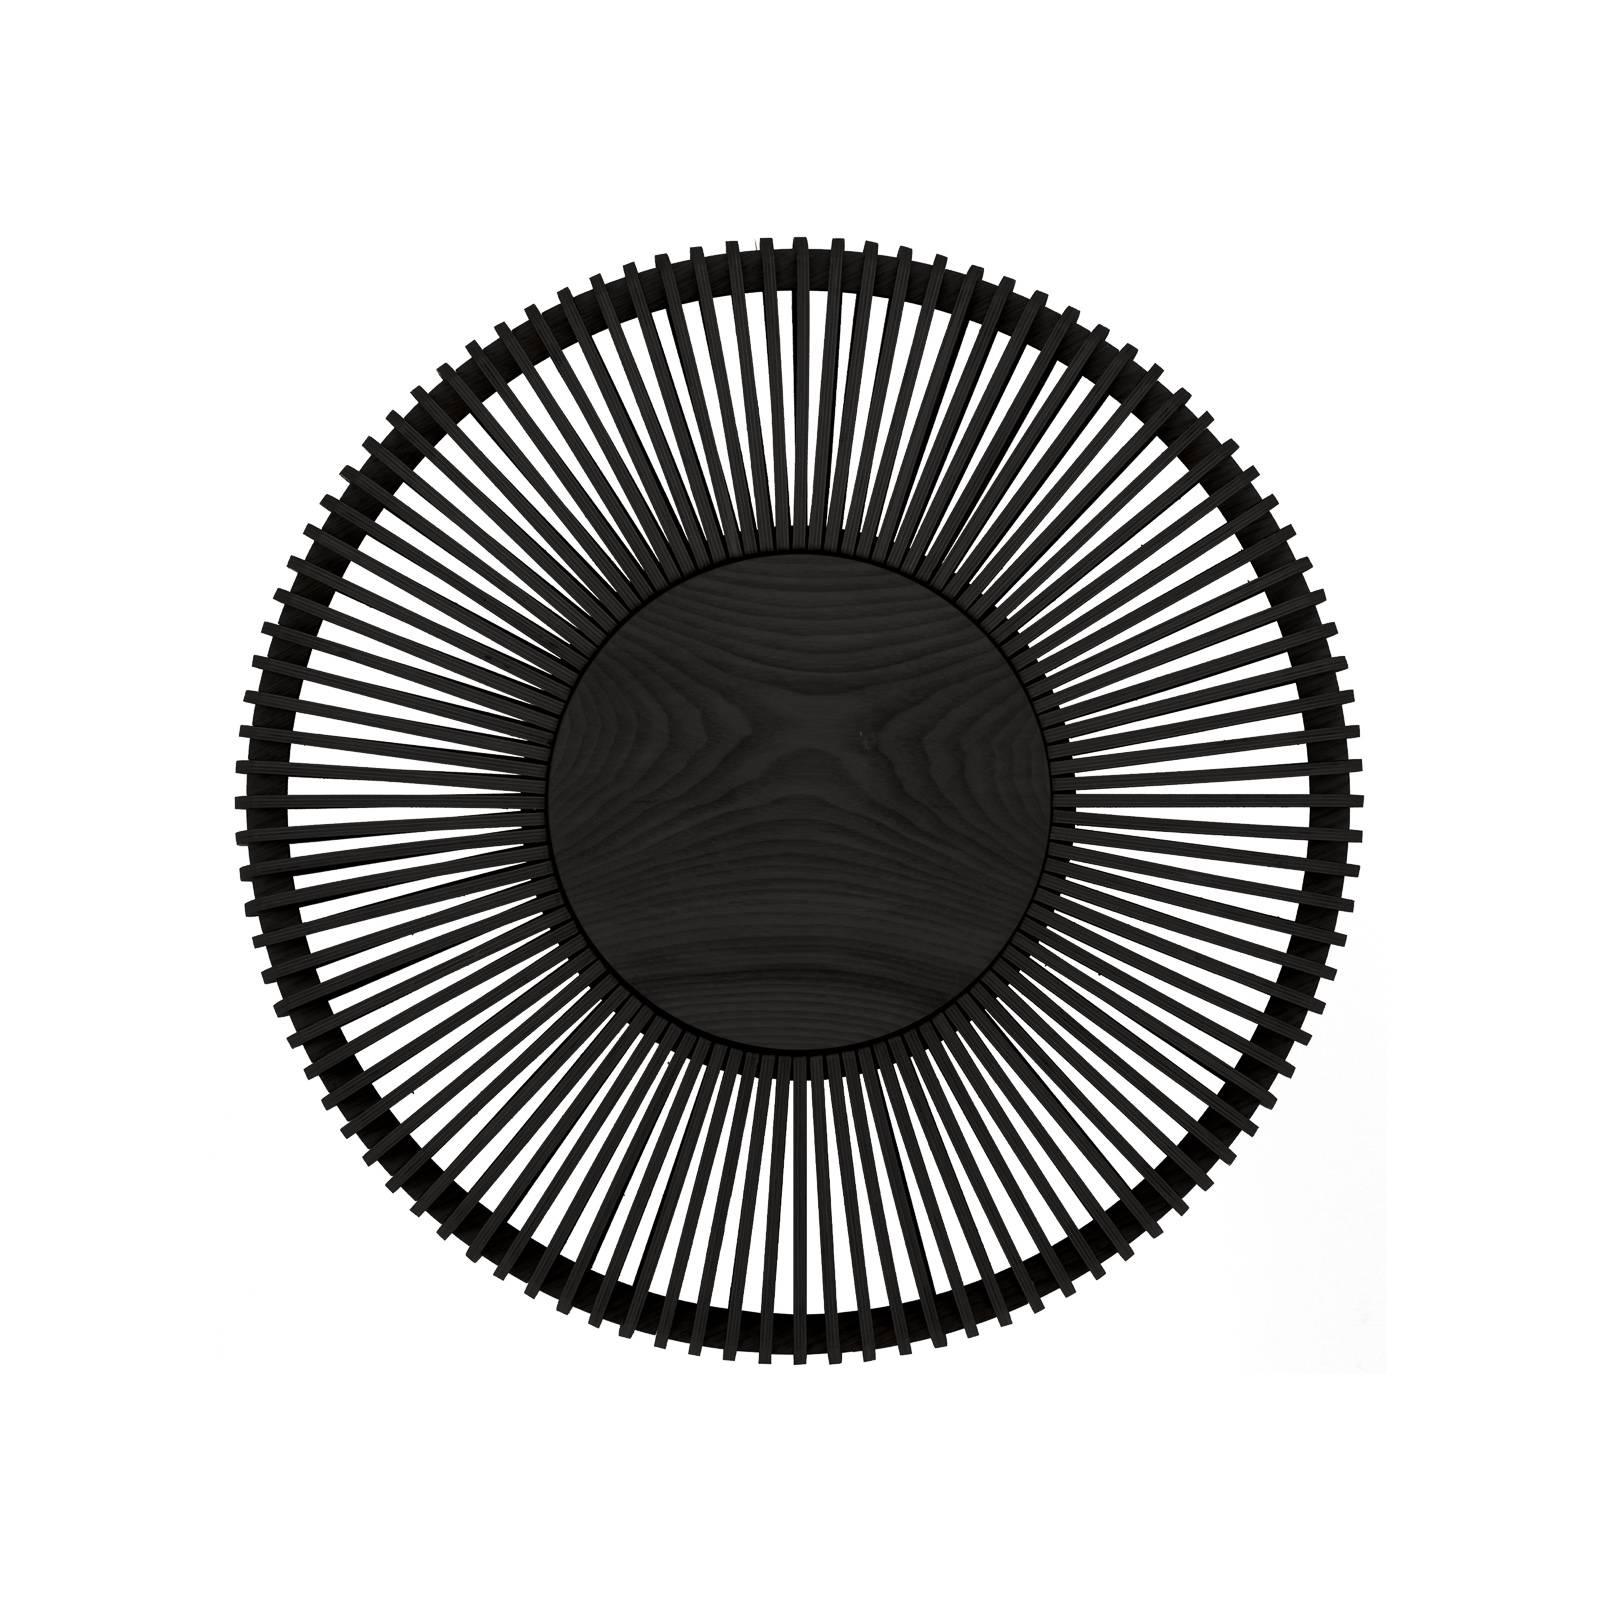 UMAGE Clava up -seinälamppu Ø 49 cm, musta puu